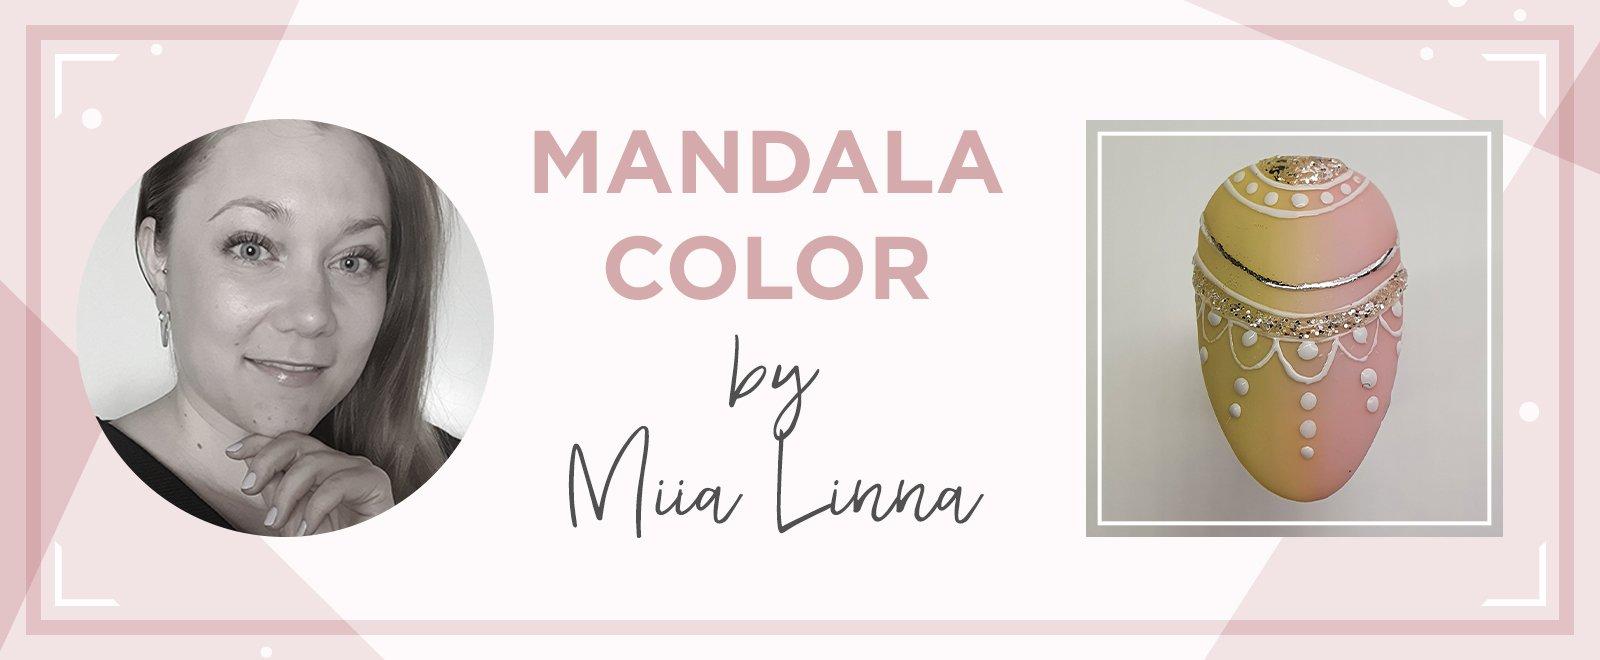 SBS_header_template_1600x660_mandala-color_Miia-Linna